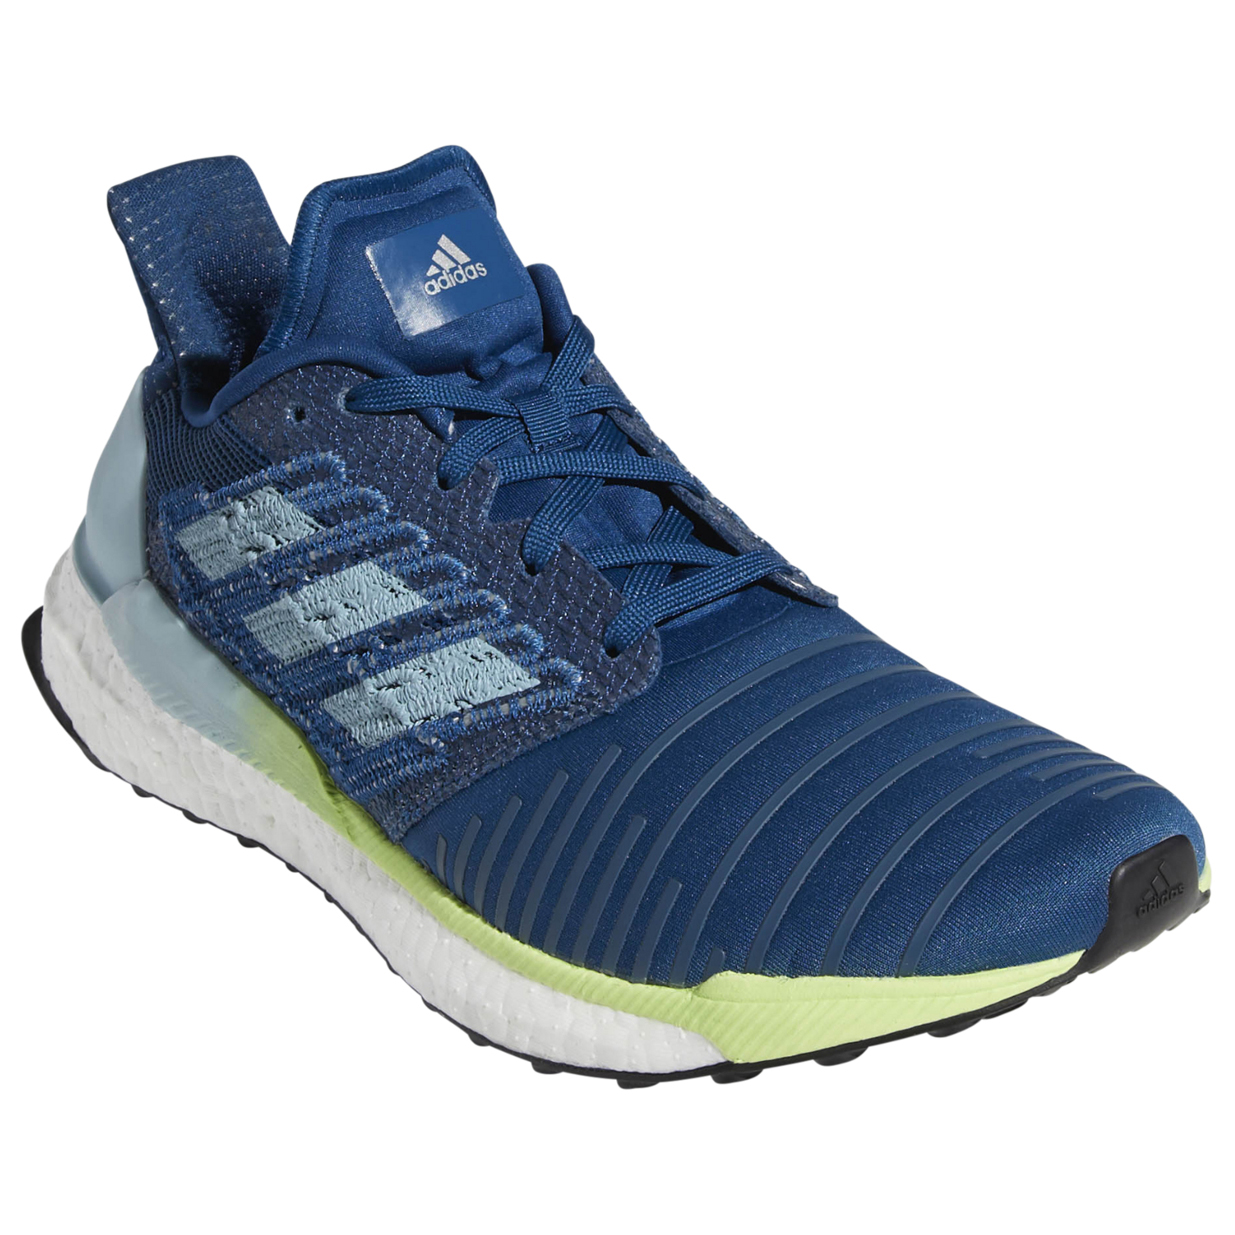 Boost Adidas Hi Solar Legend Yellow9 Ash 5uk Res Grey Marine Runningschuhe vONwm80n